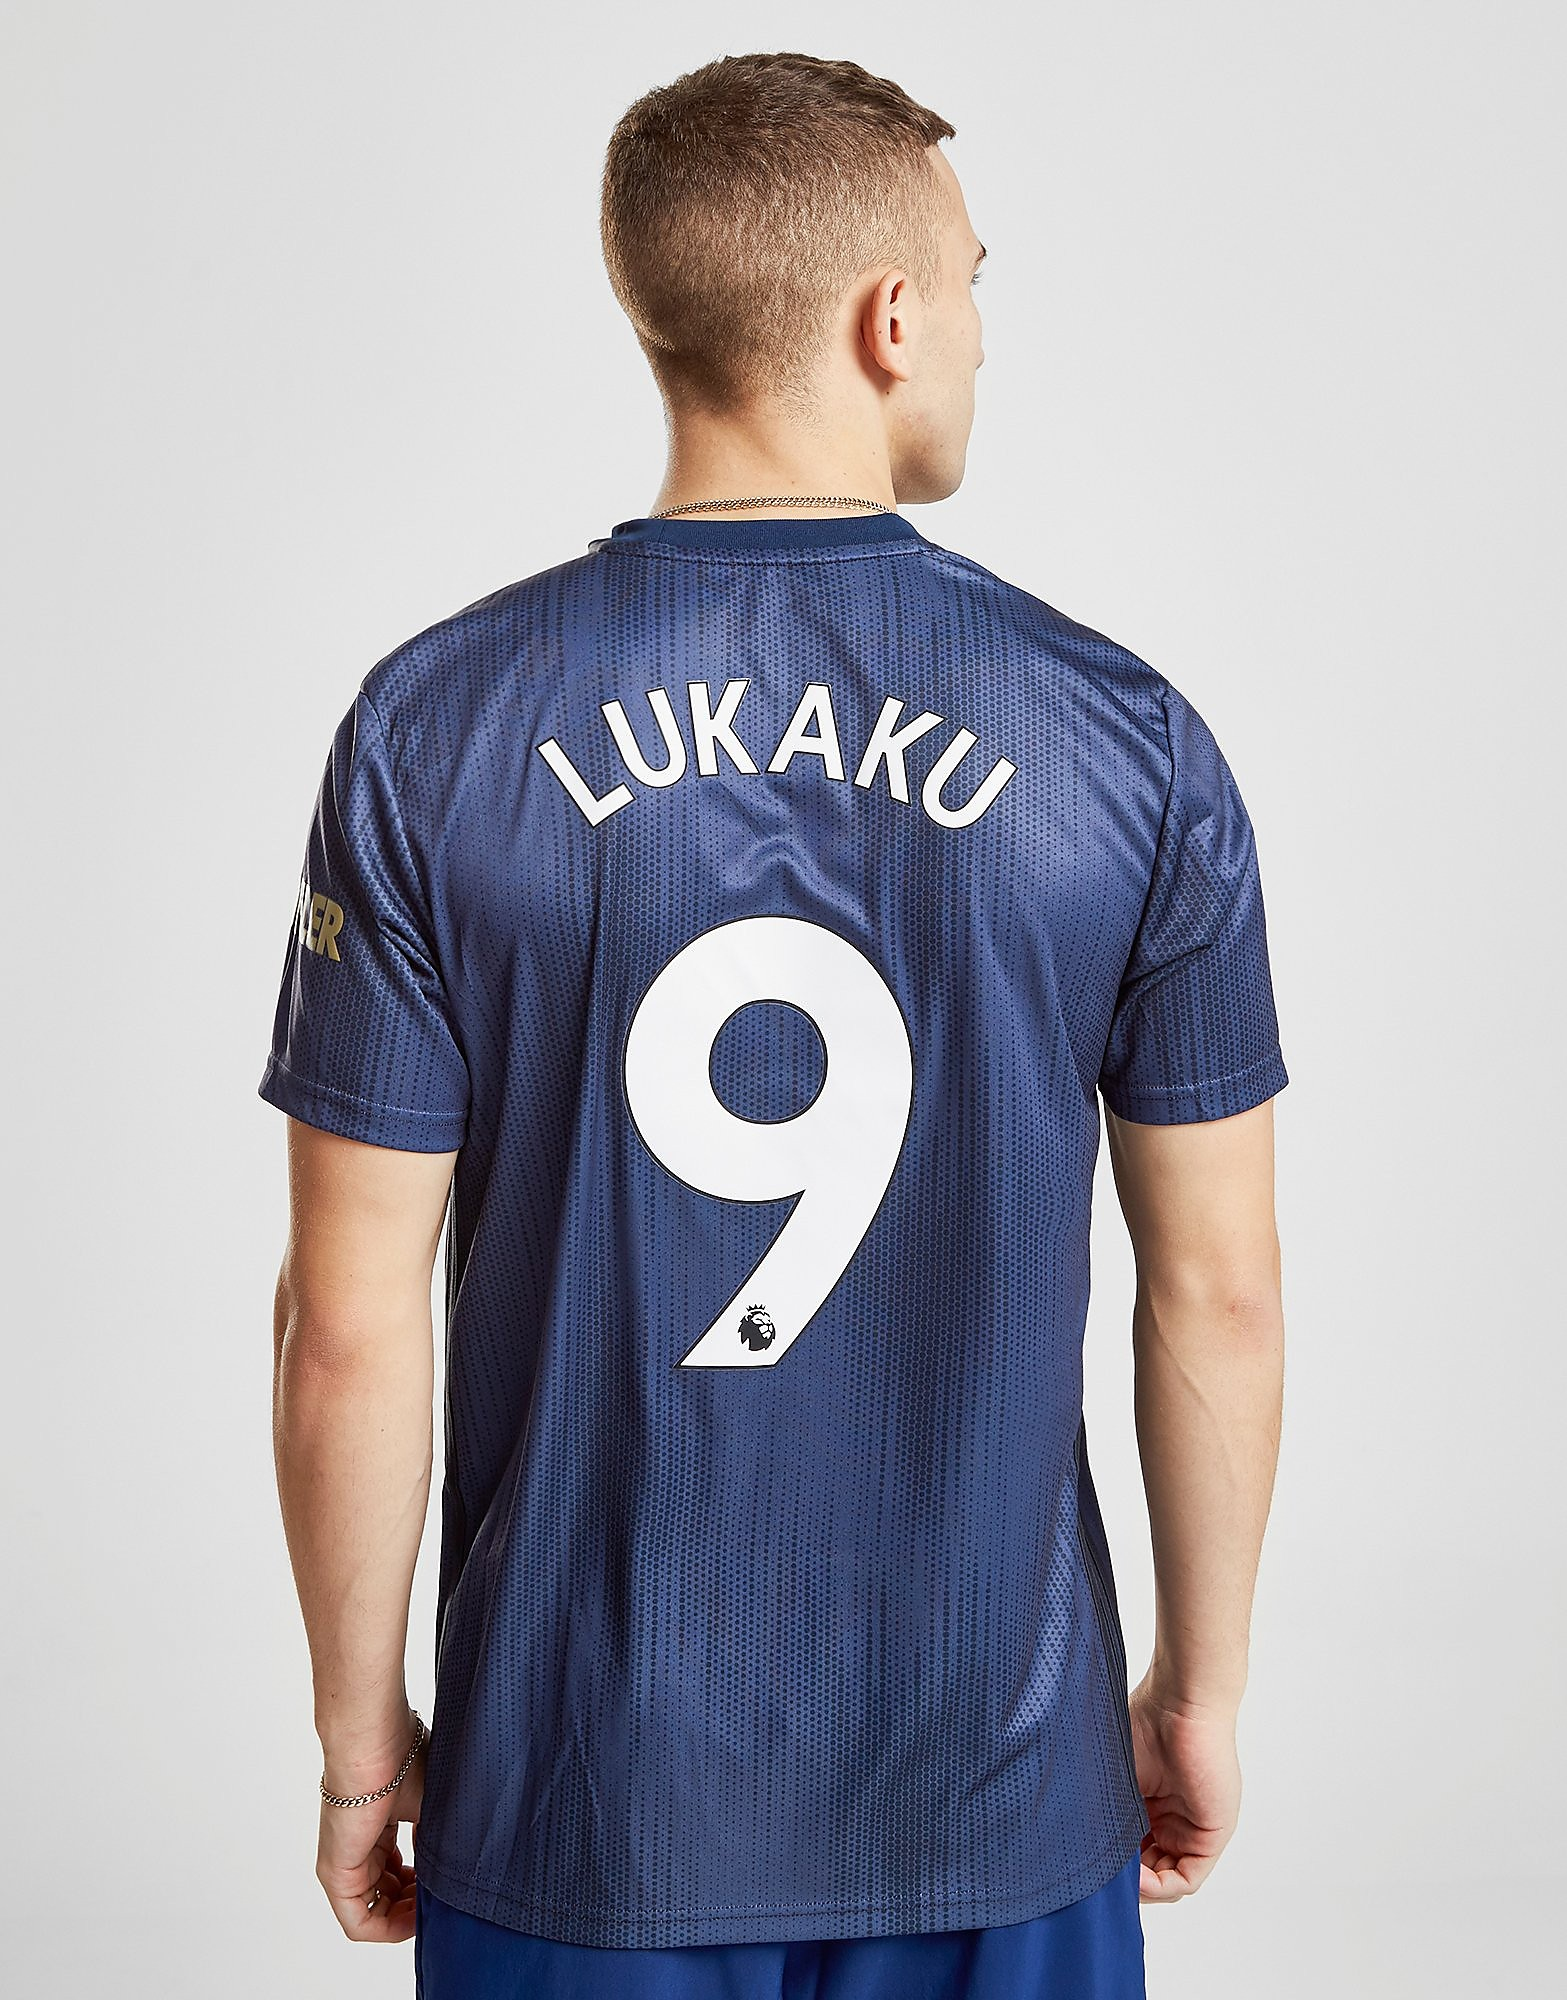 adidas Manchester United FC 2018/19 Lukaku #9 Third Shirt - Blauw - Heren